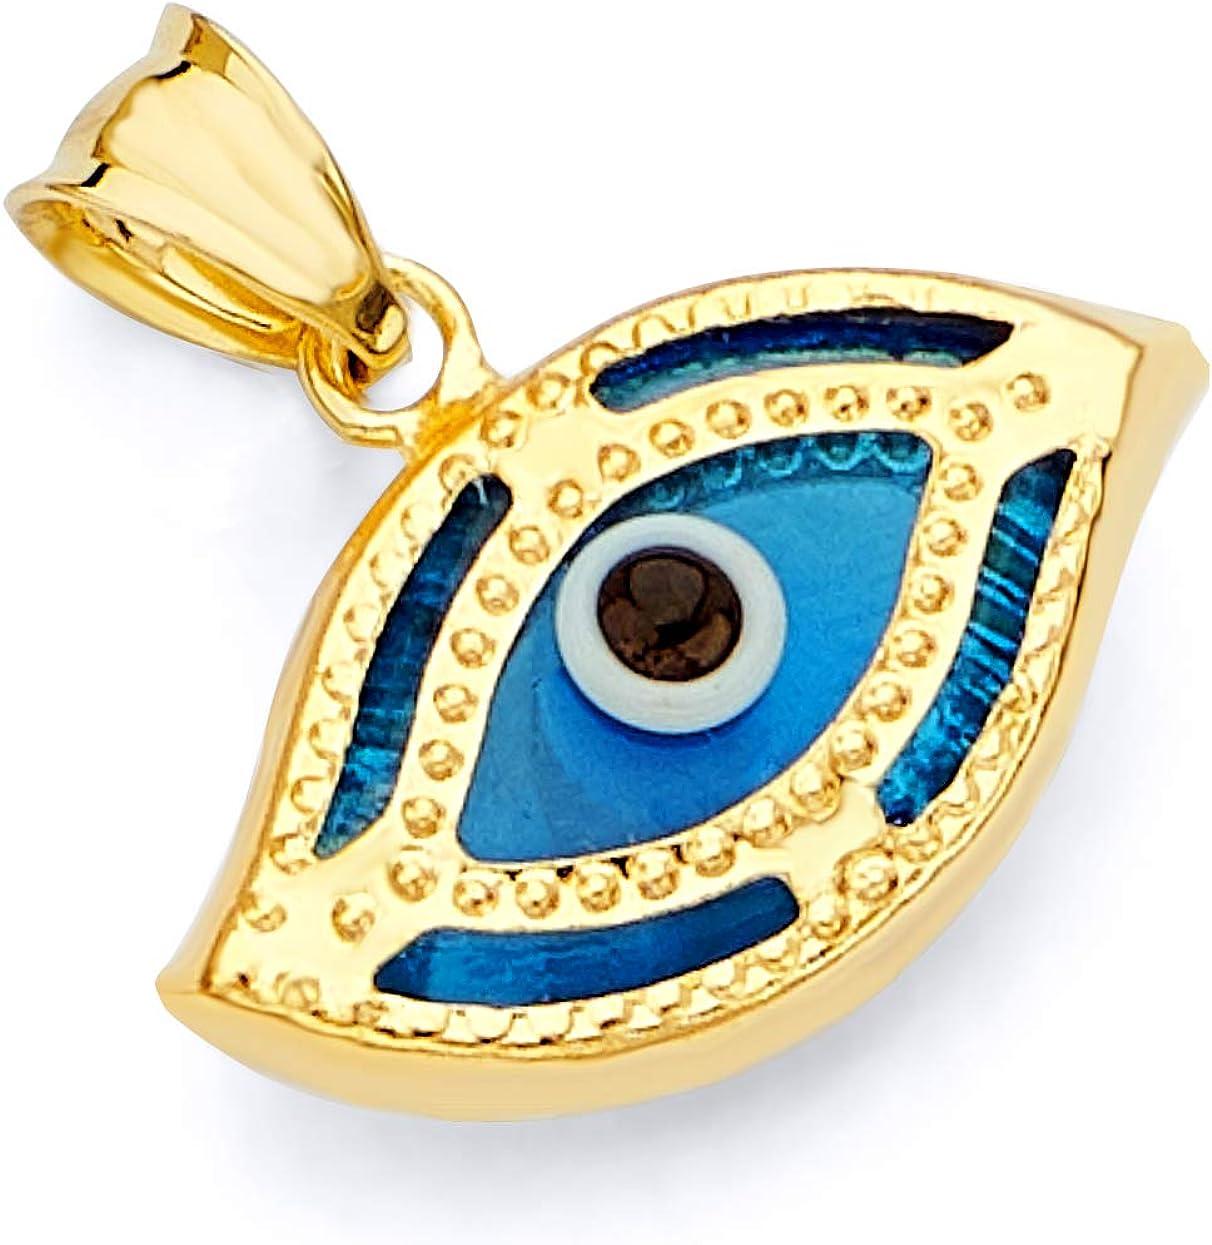 Heart Necklace Dark Blue Enamel Evil Eye Pendant 17x19mm 24k Shiny Gold Plated Heart Shaped Evil Eye Charms GLD015